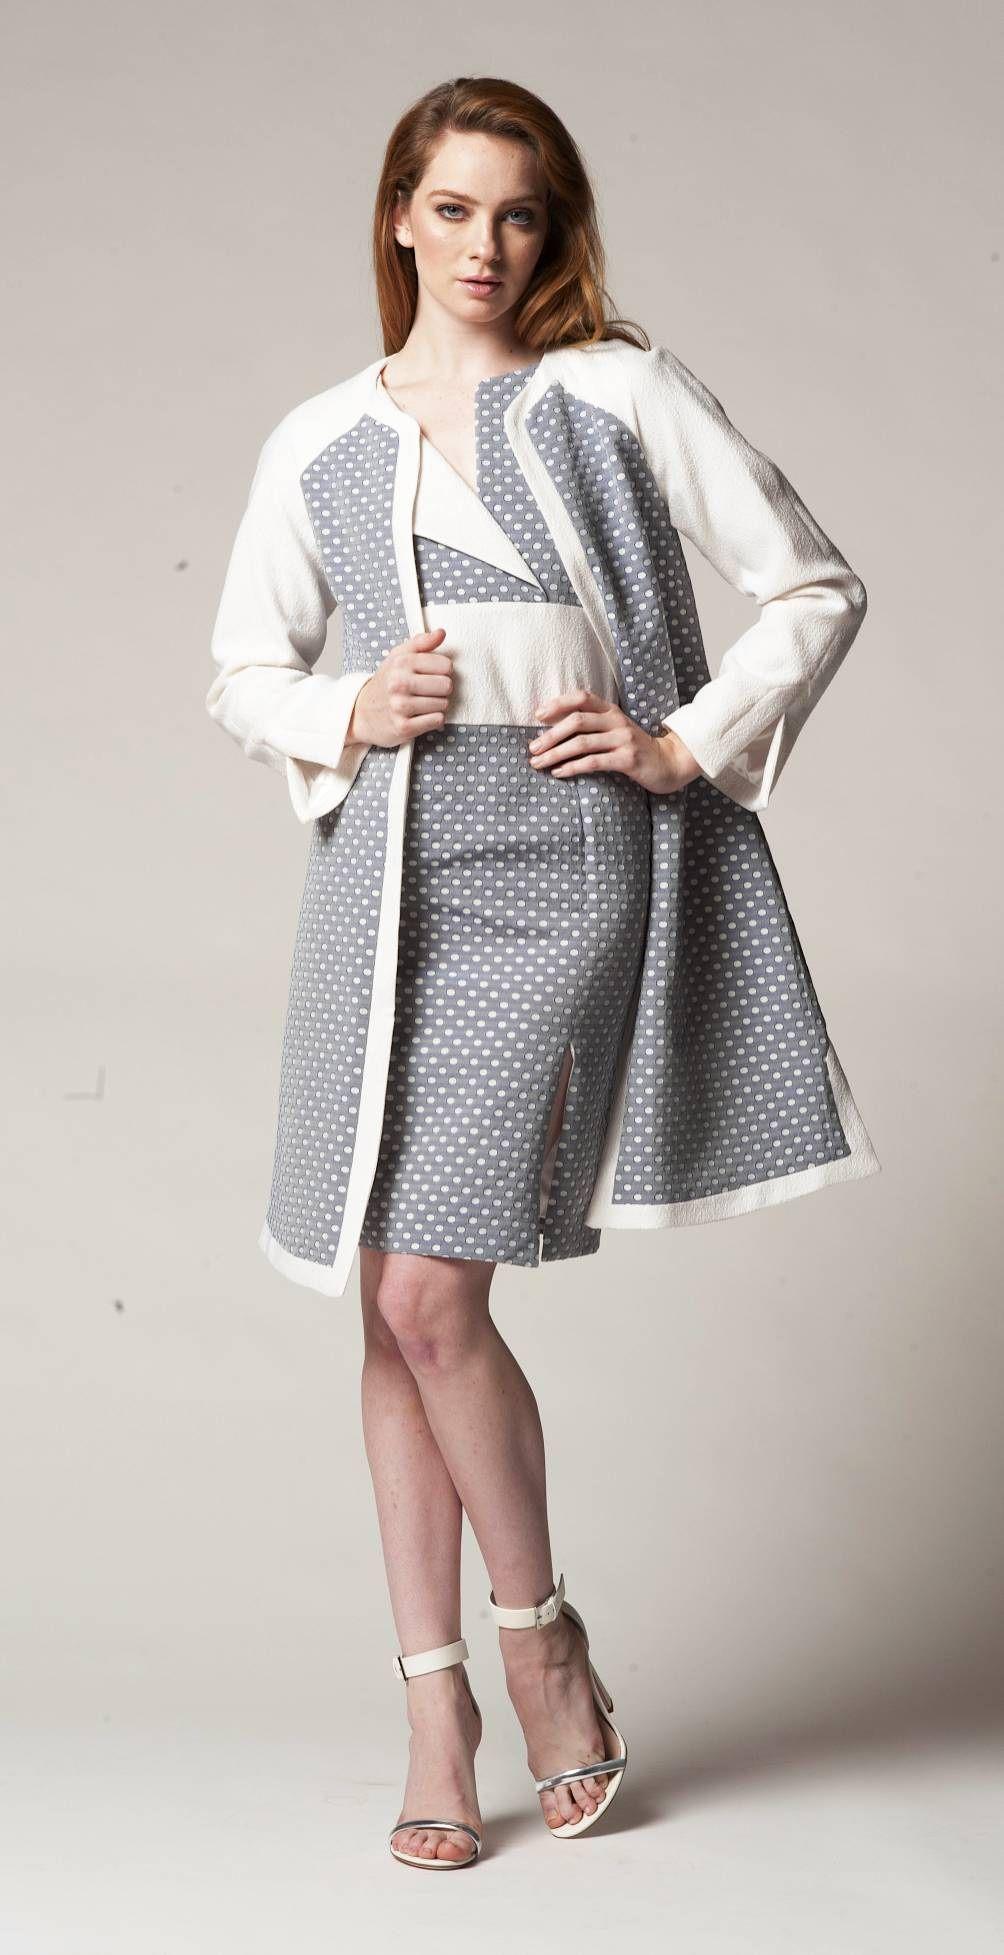 Twotone long coat u dress springsummer pinterest spring